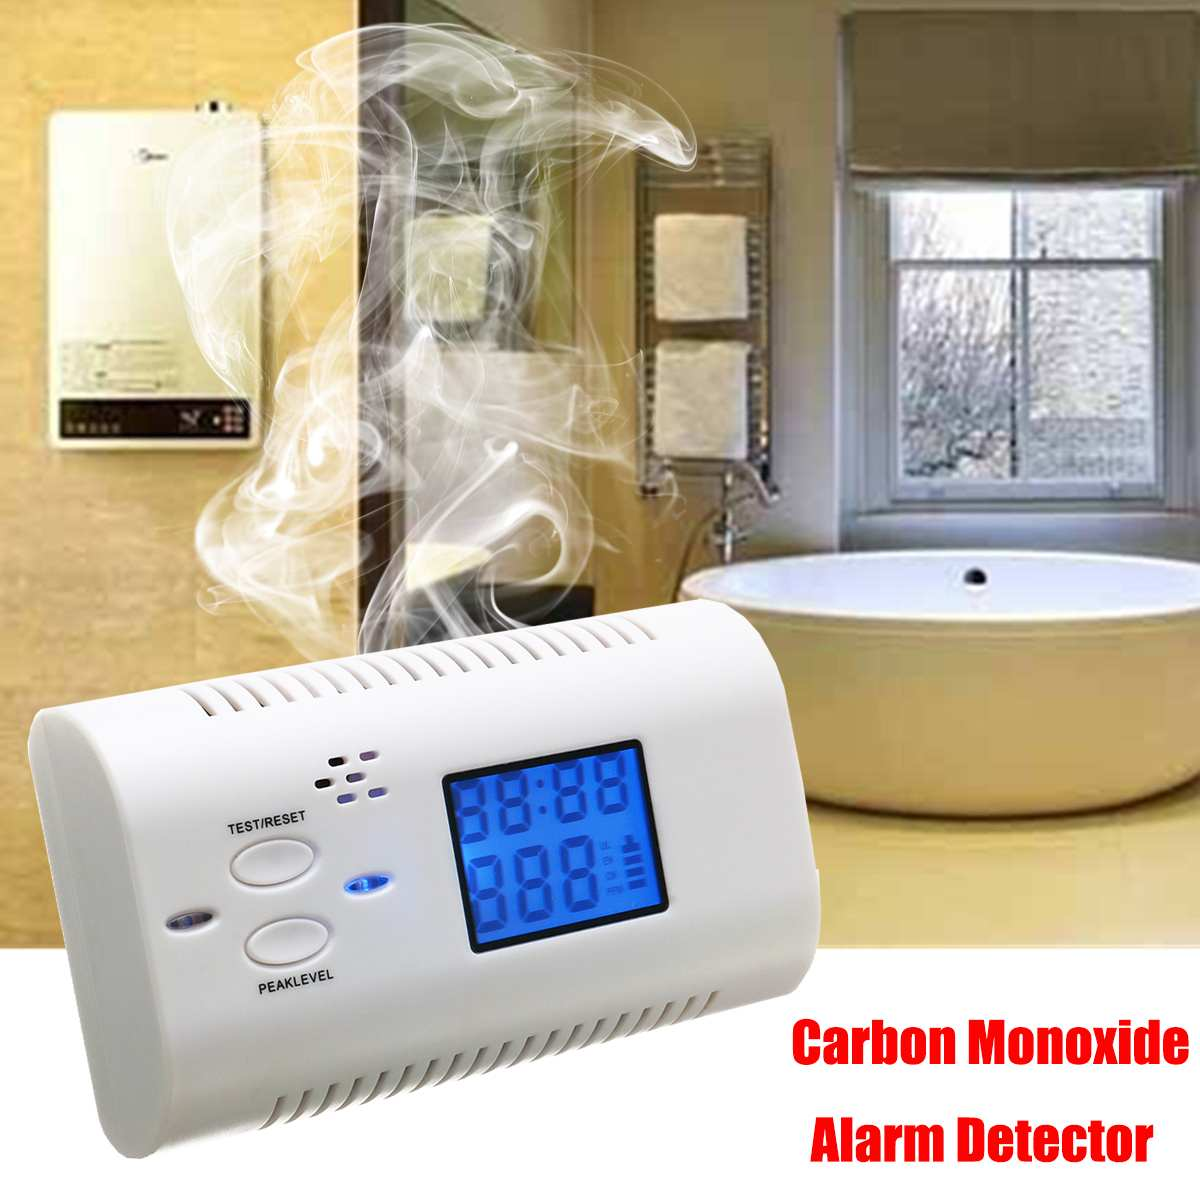 Security Alarm Voice Carbon Monoxide Detector LCD Display Poisoning Gas Alarm Sensor Co Detector 9V Battery For Home Kitchen